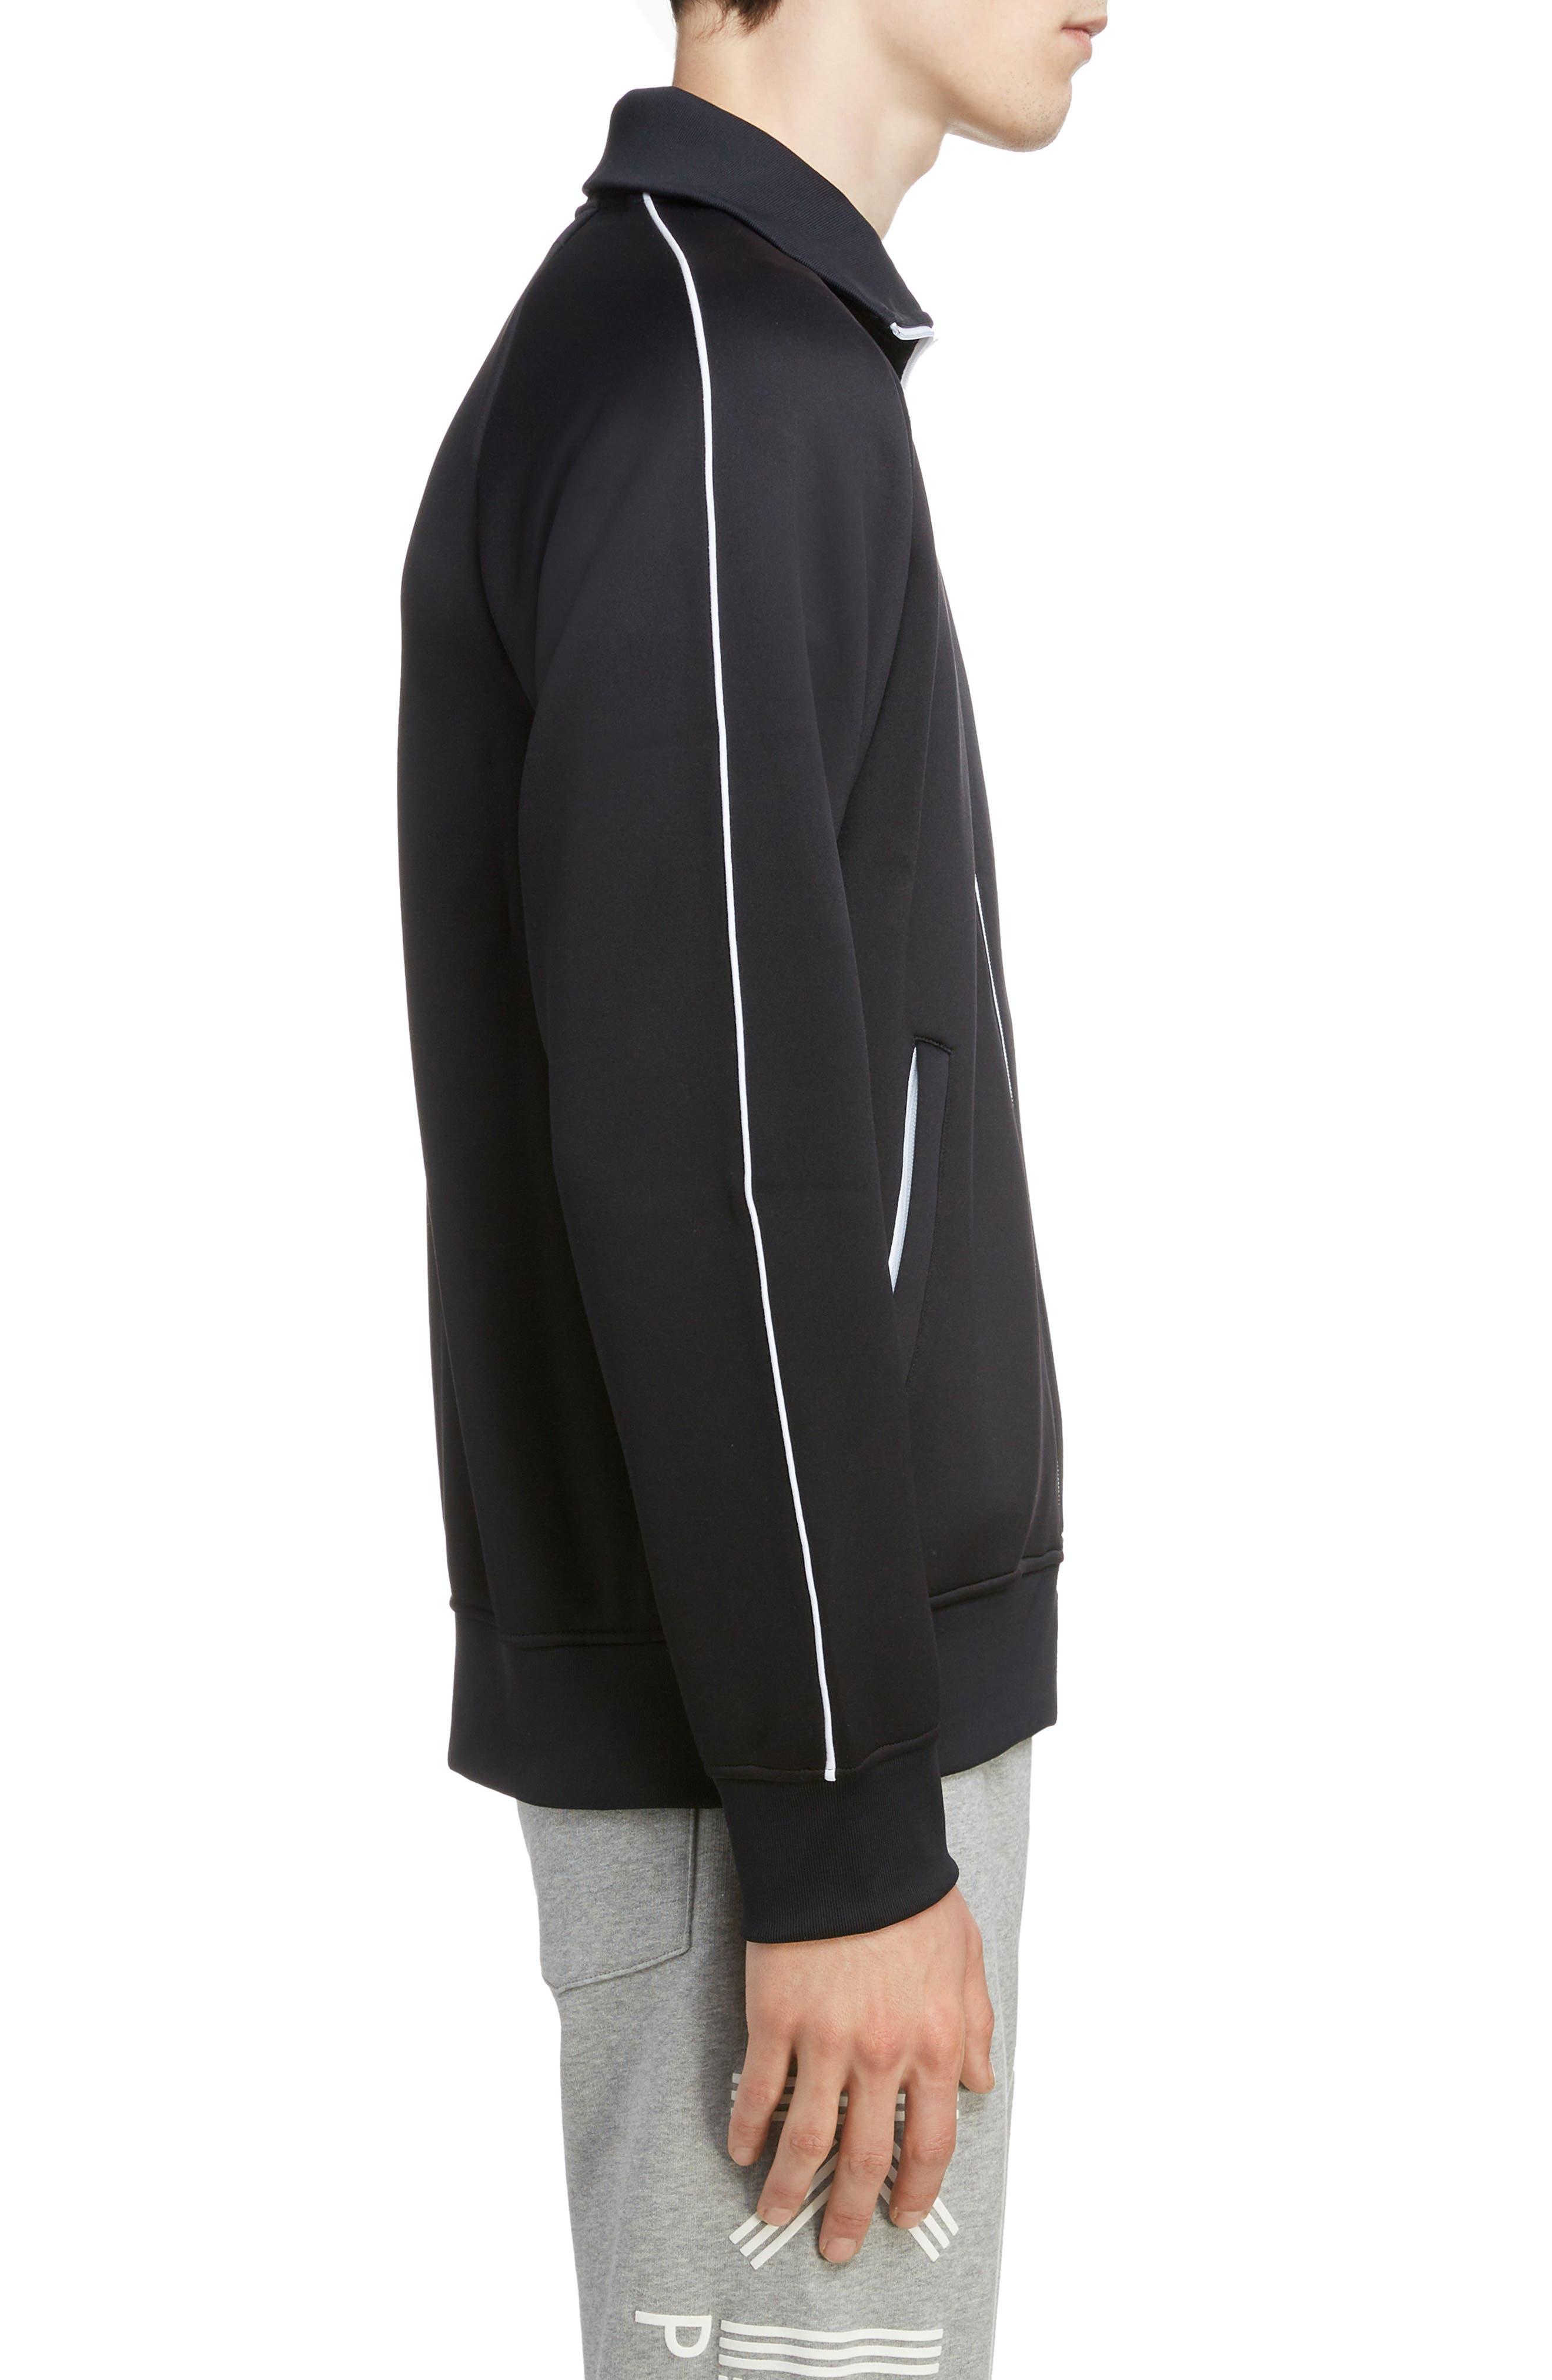 KENZO, Zip Track Jacket, Alternate thumbnail 3, color, BLACK